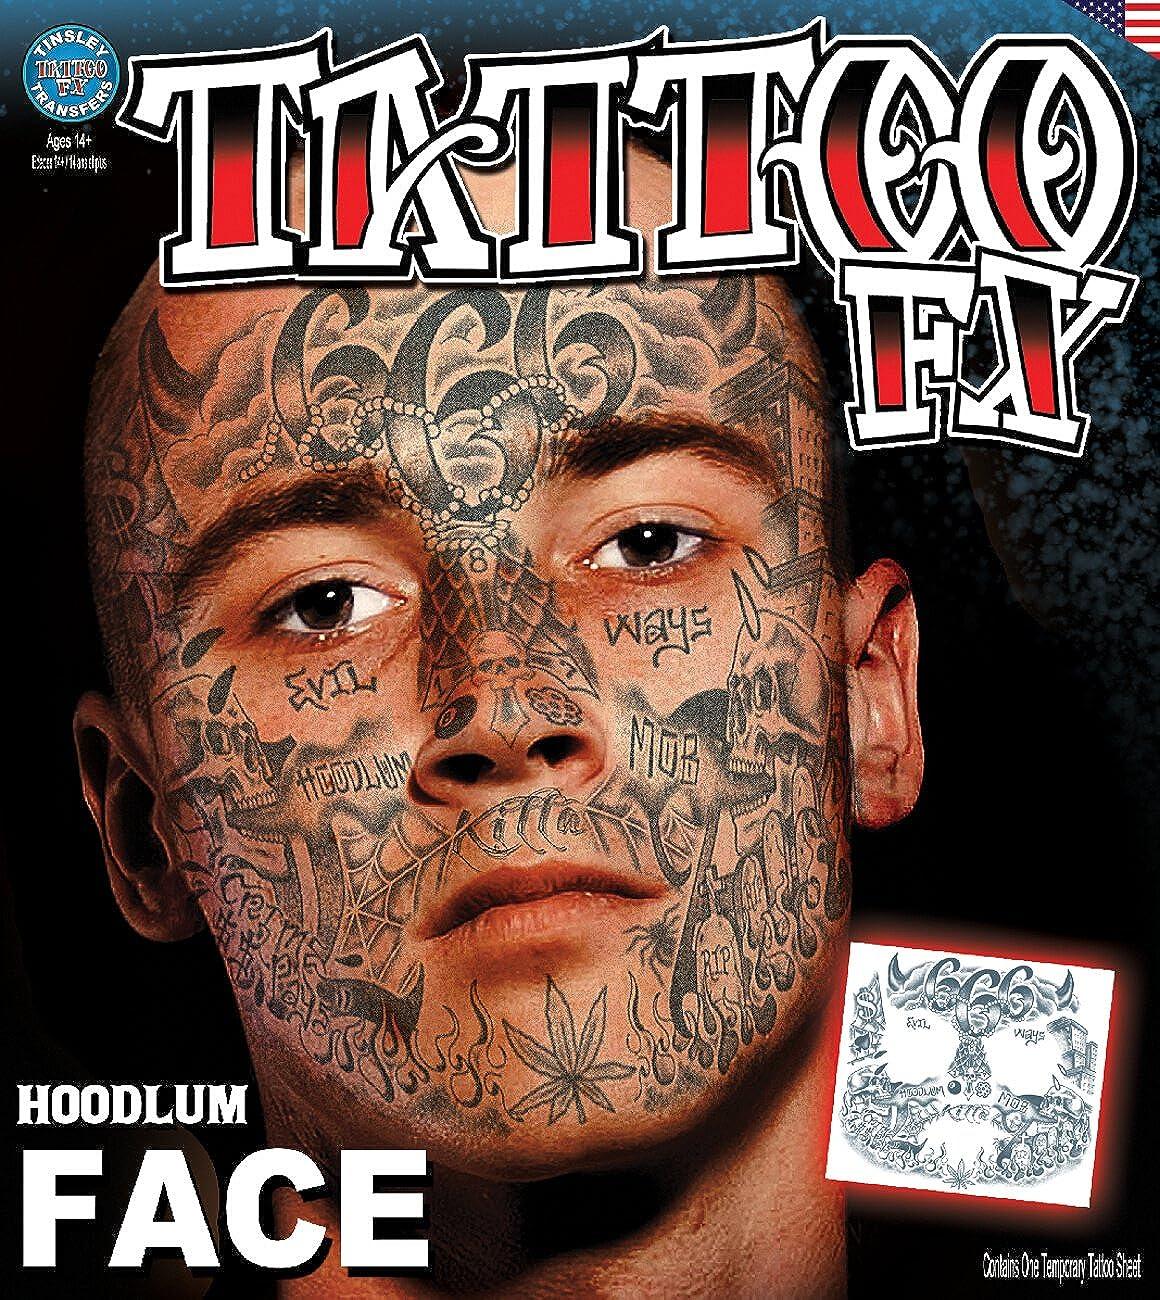 9e666b363 Amazon.com: Tinsley Transfers Hoodlum Face Tatttoo Temporary Tattoo:  Clothing